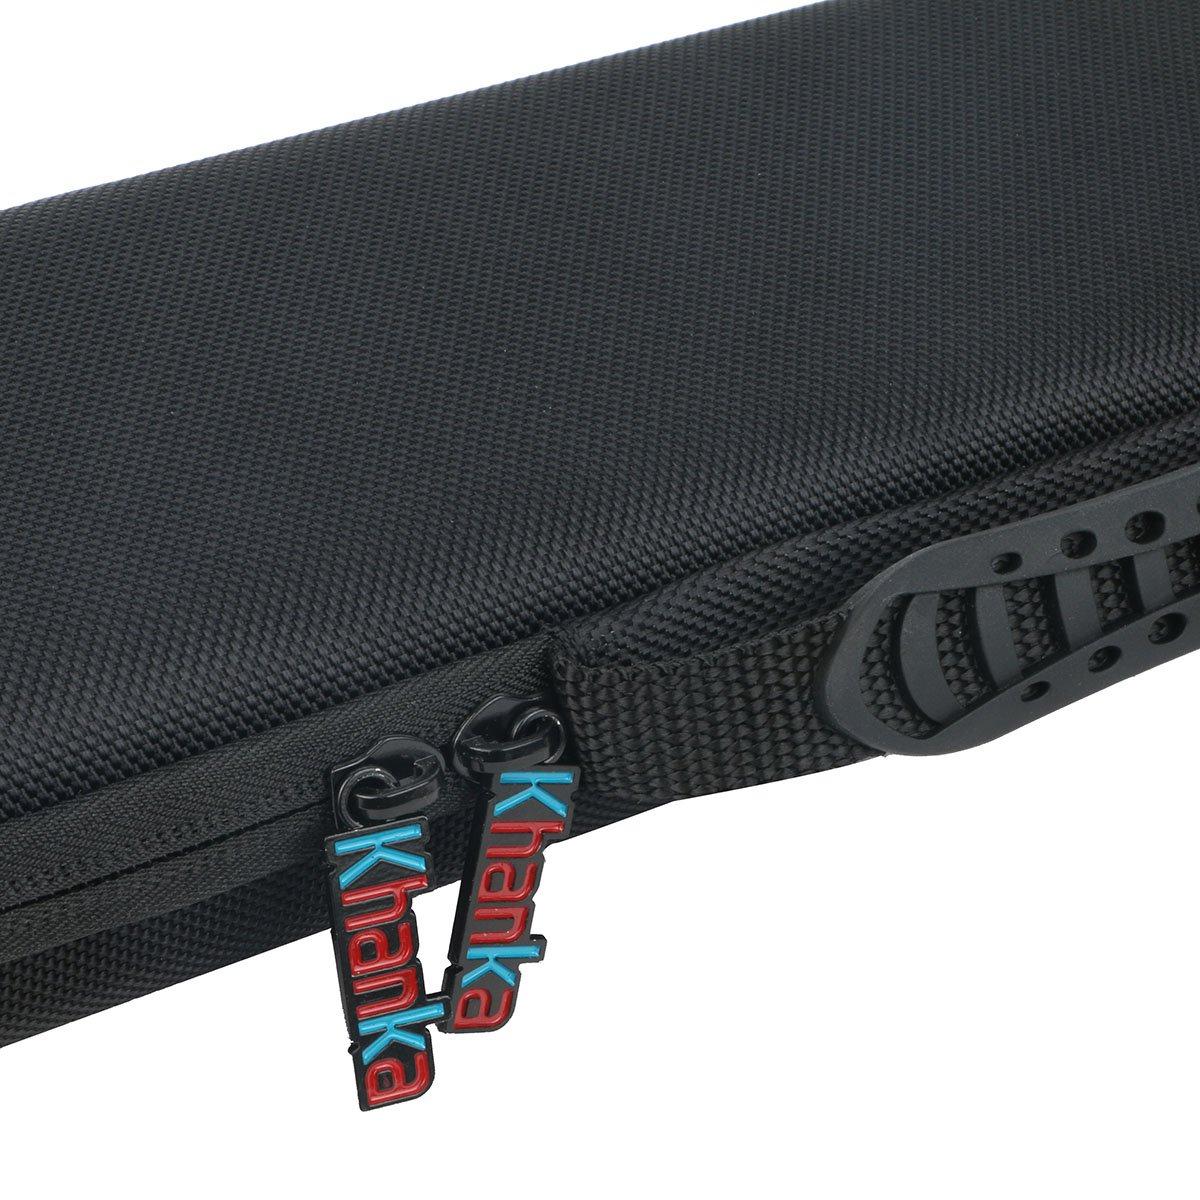 Khanka Hard Case for Akai Professional LPK25 | 25-Key Ultra-Portable USB MIDI Keyboard Controller by Khanka